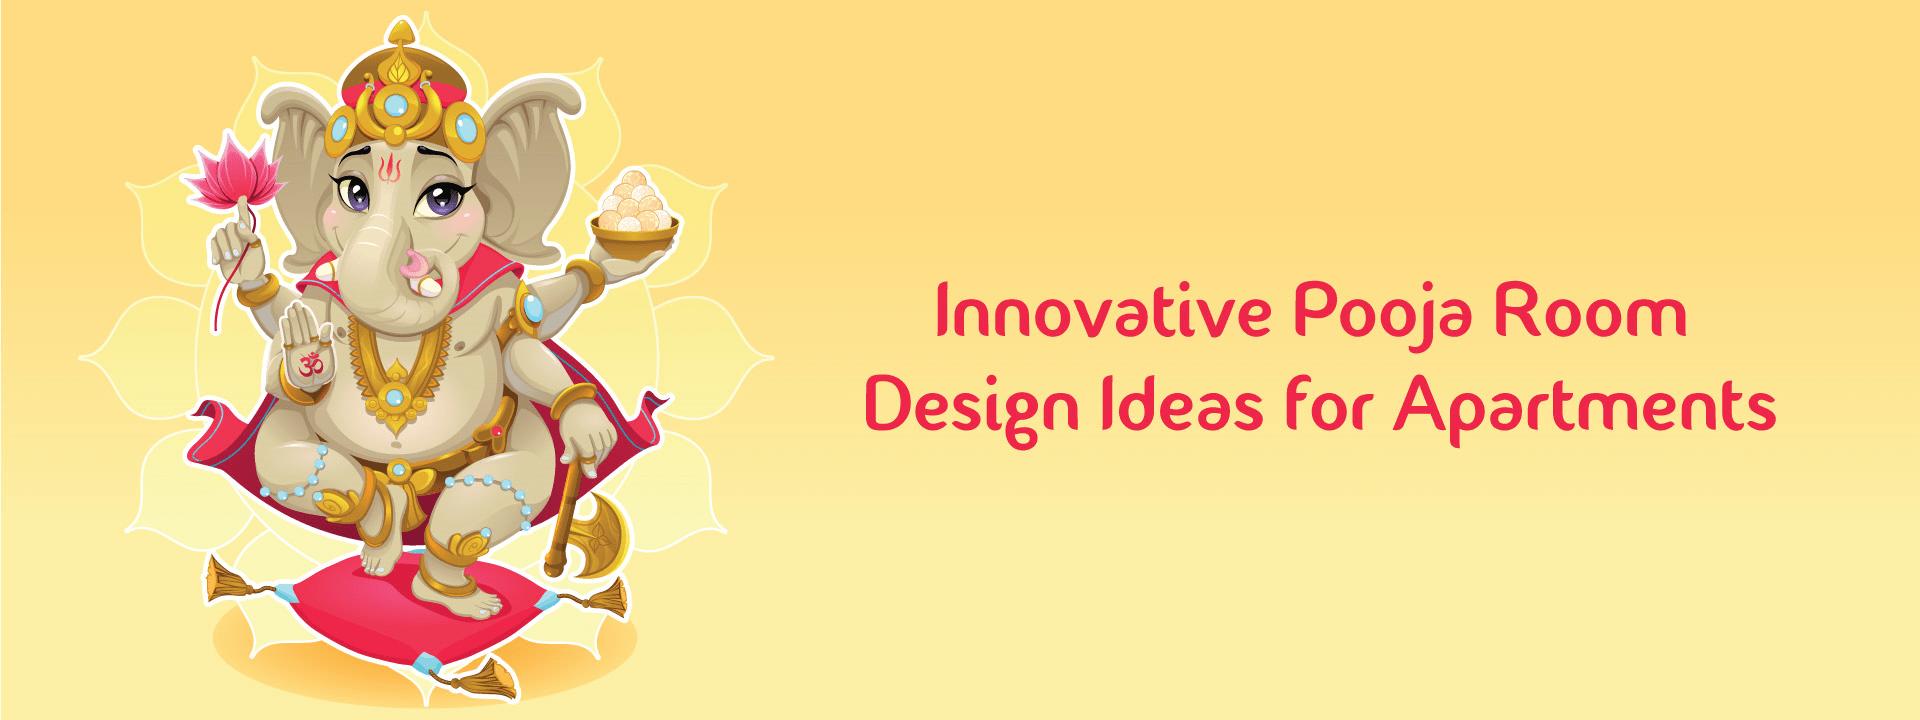 Innovative Pooja Room Design Ideas for Apartments